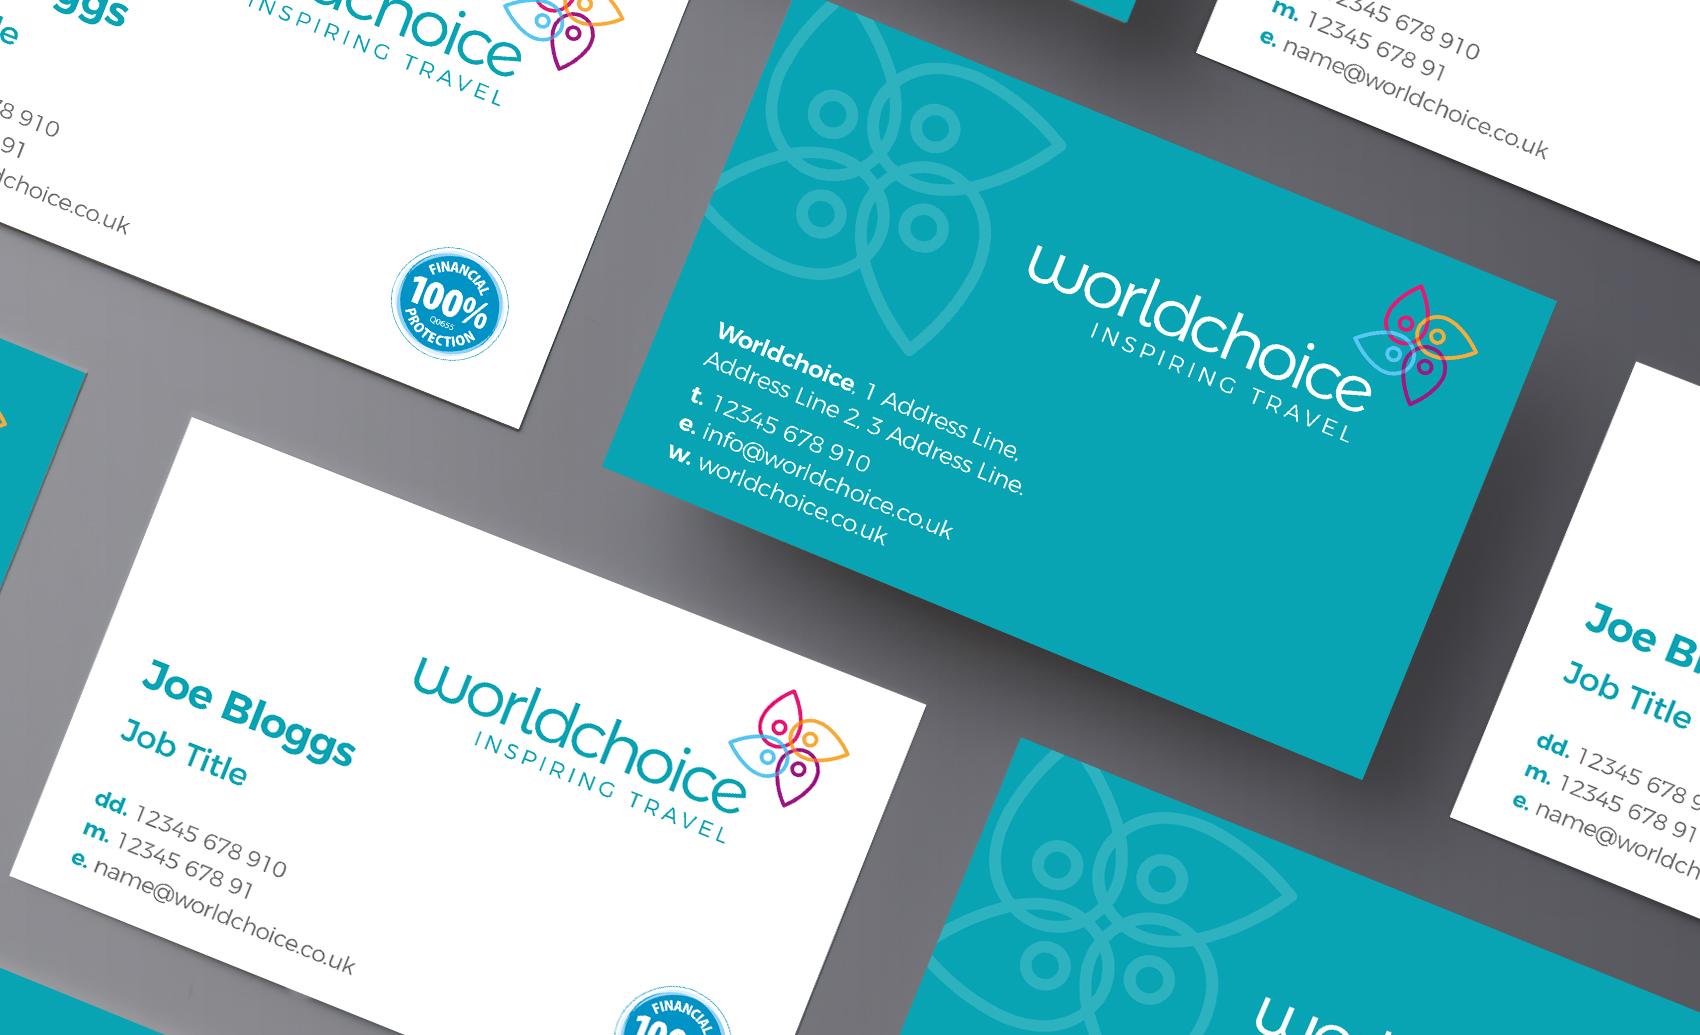 Worldchioce Business Card